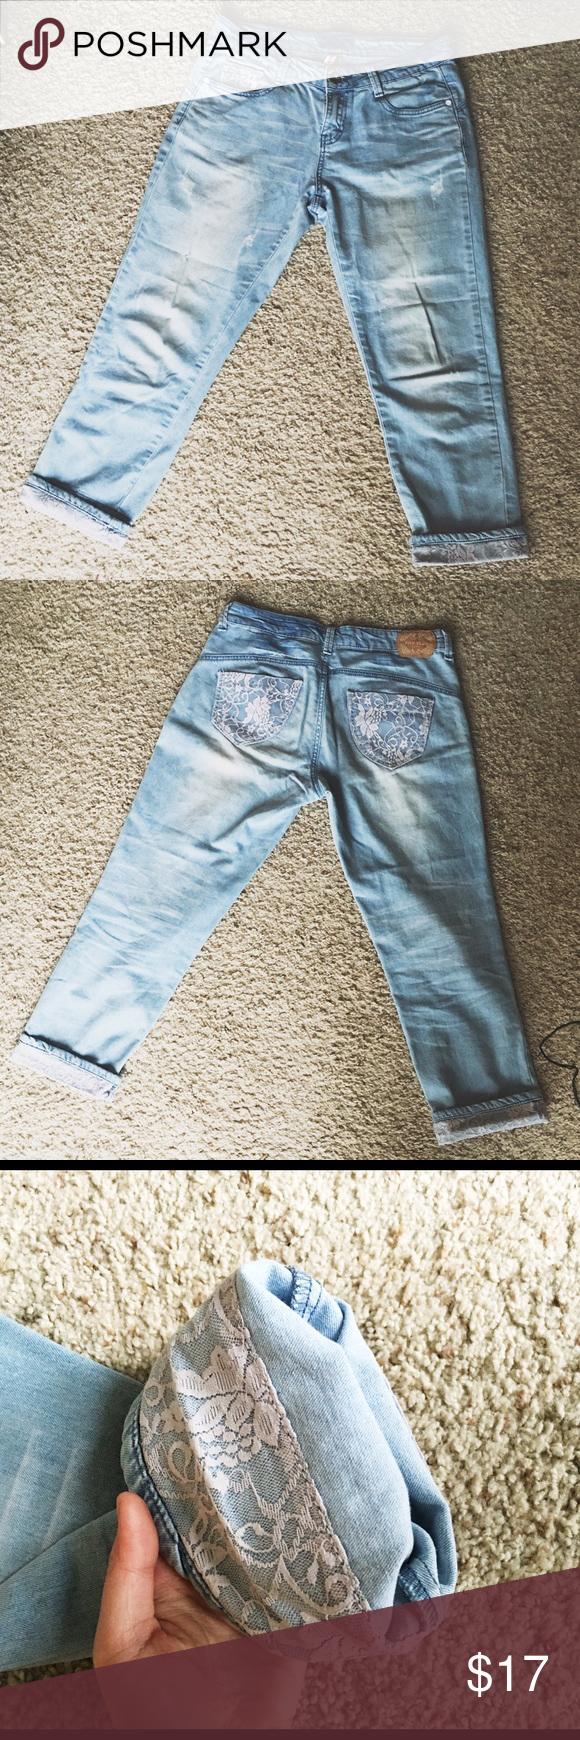 Five Plus Ankle Jeans Vintage boyfriend style cute jeans. In good condition. Very comfy! Five Plus Jeans Boyfriend